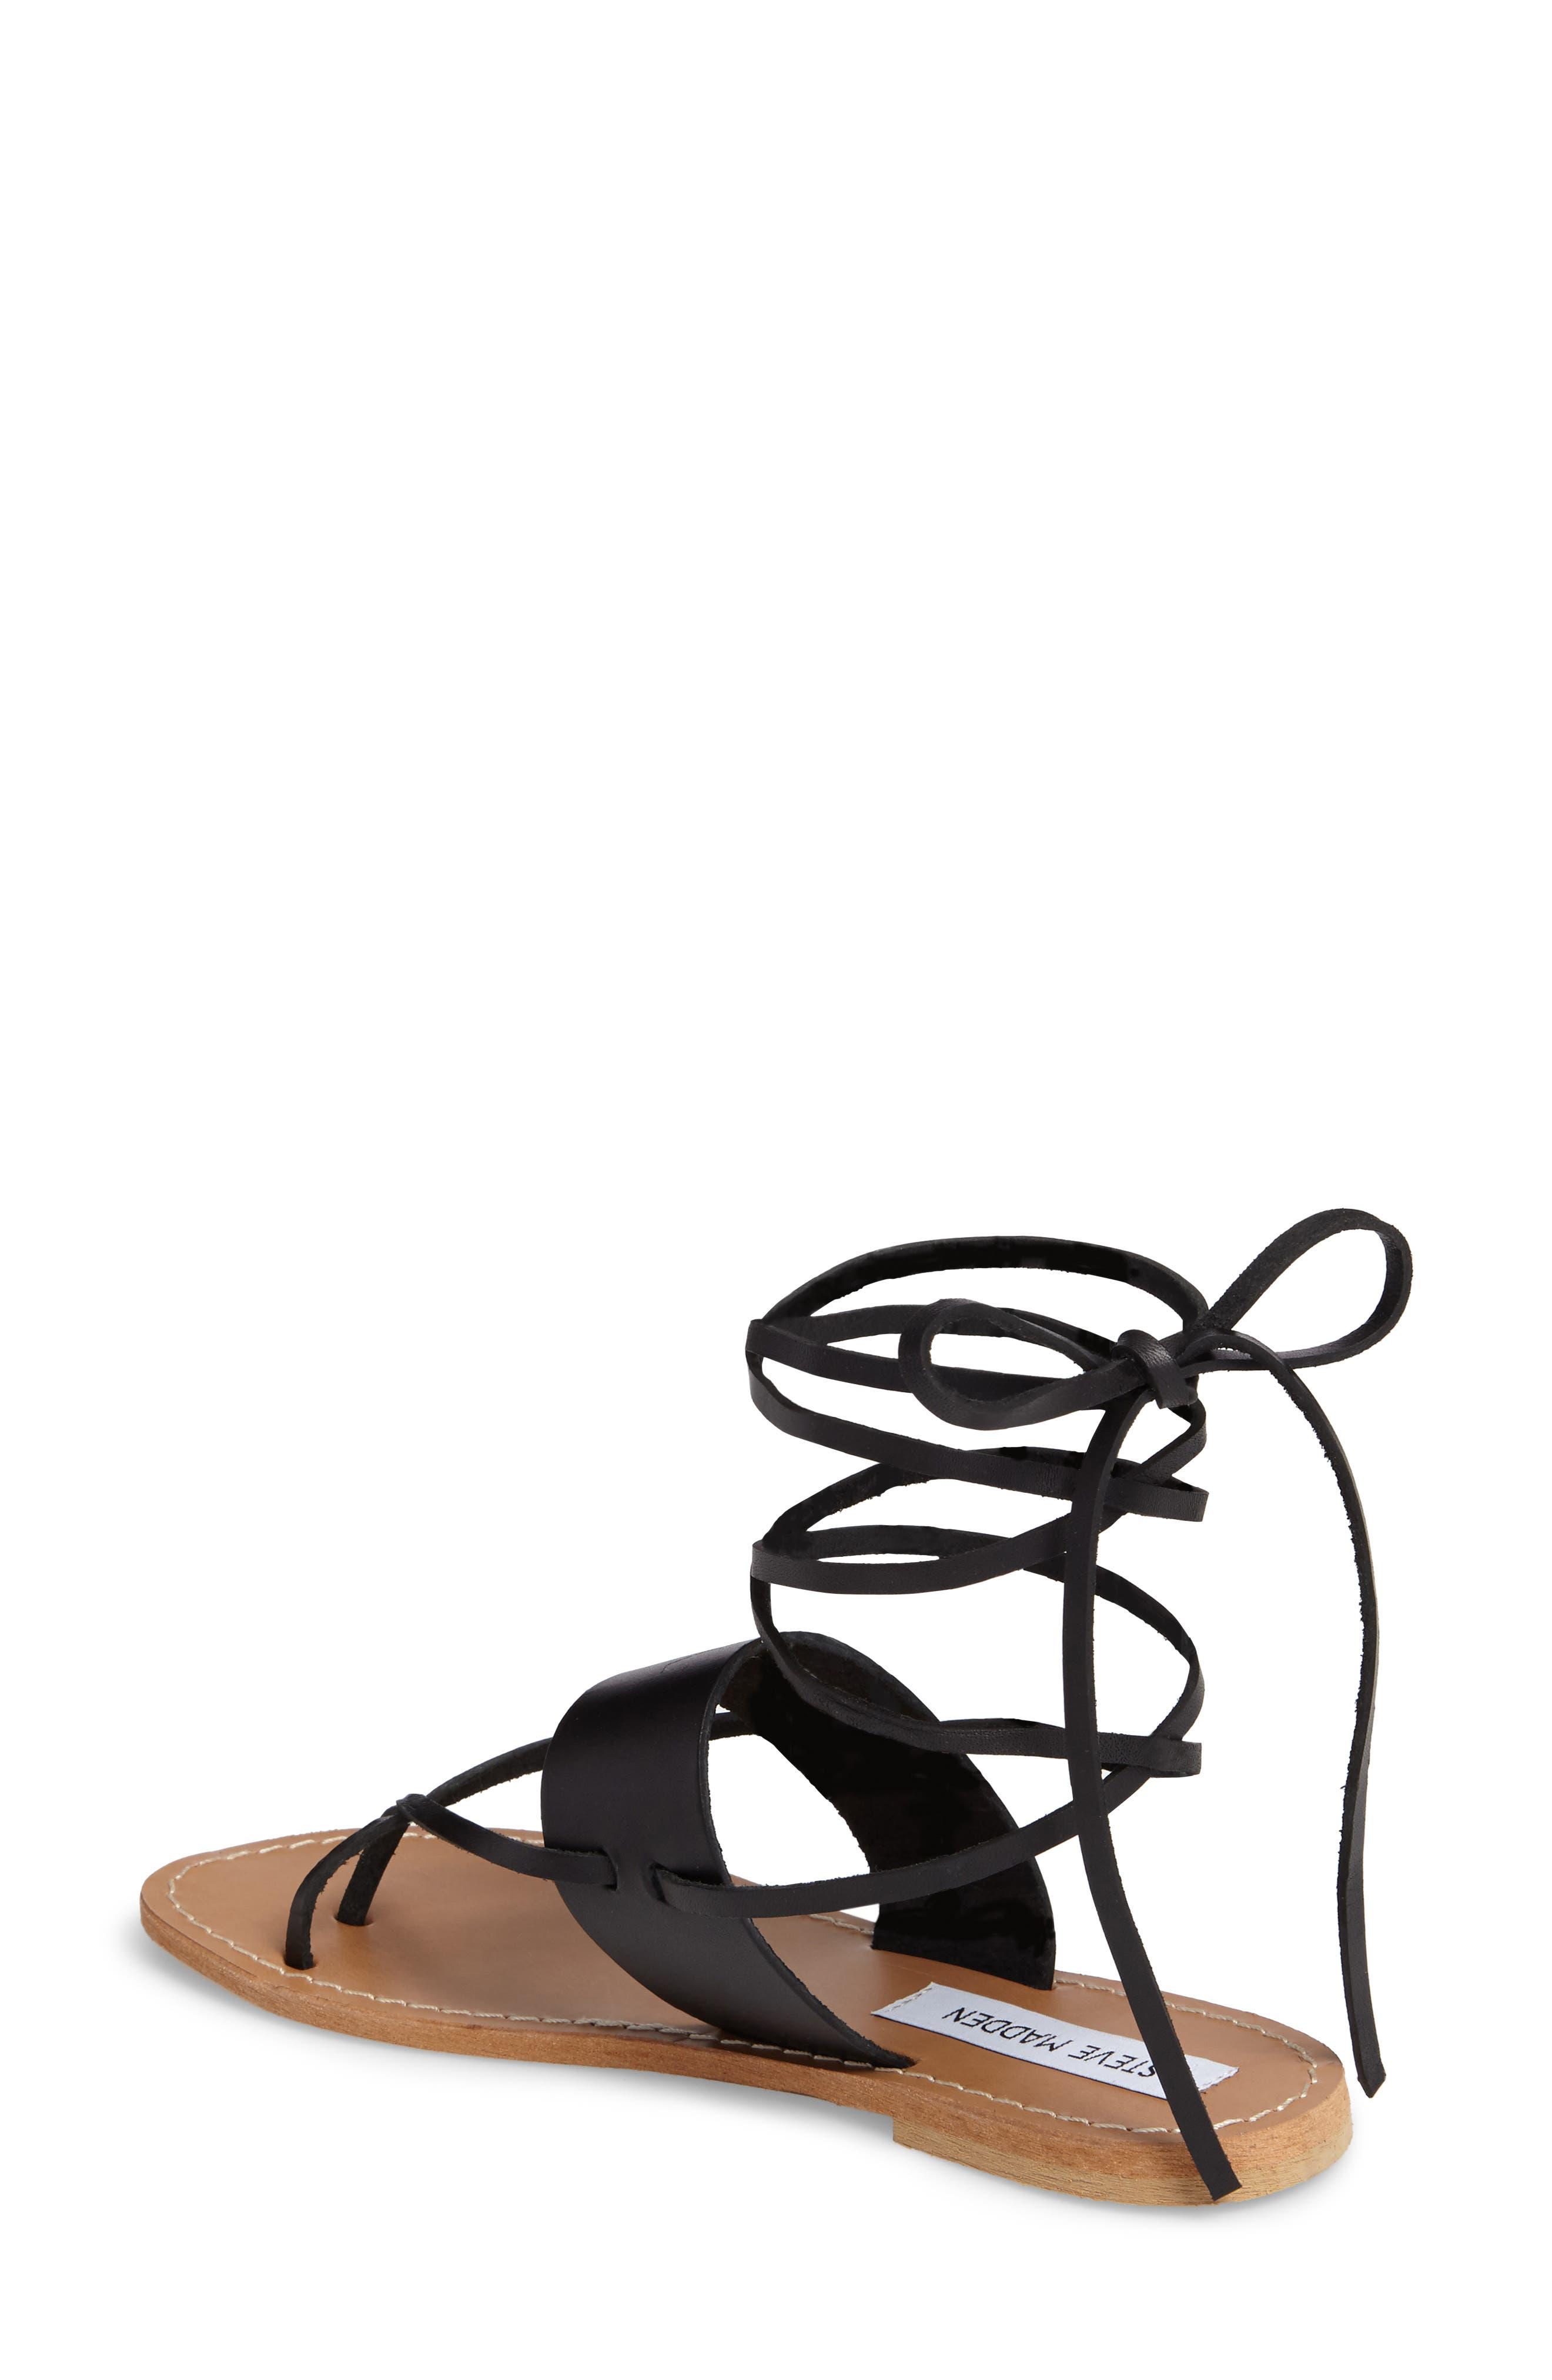 Bianca Lace-Up Sandal,                             Alternate thumbnail 2, color,                             001